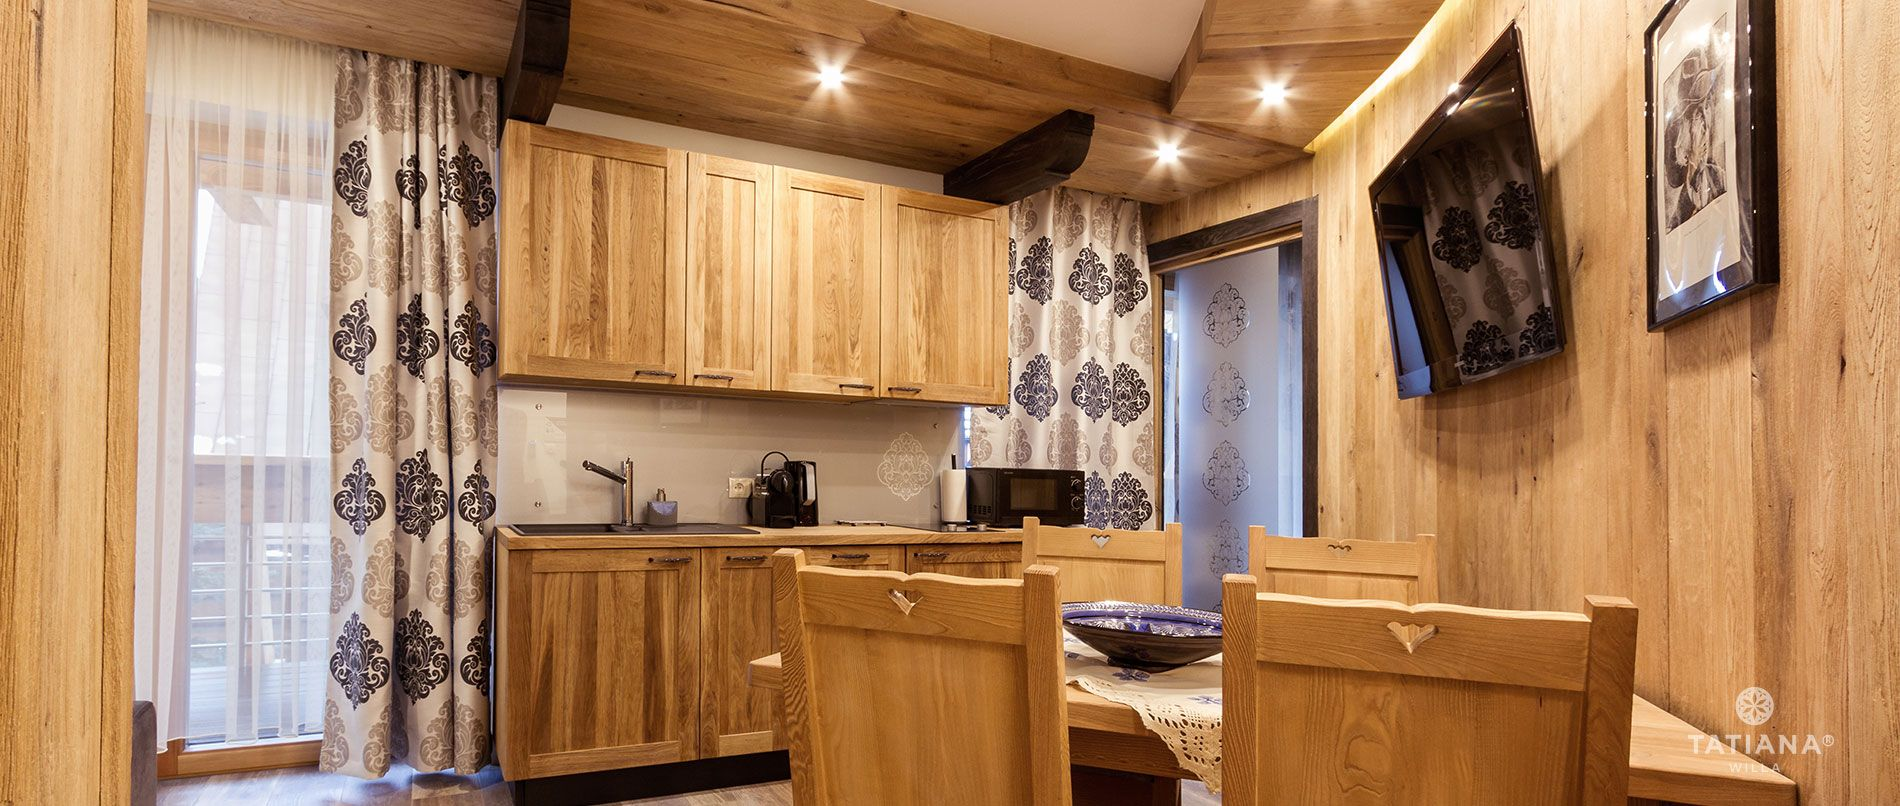 Apartament Stary Dębowy - aneks kuchenny